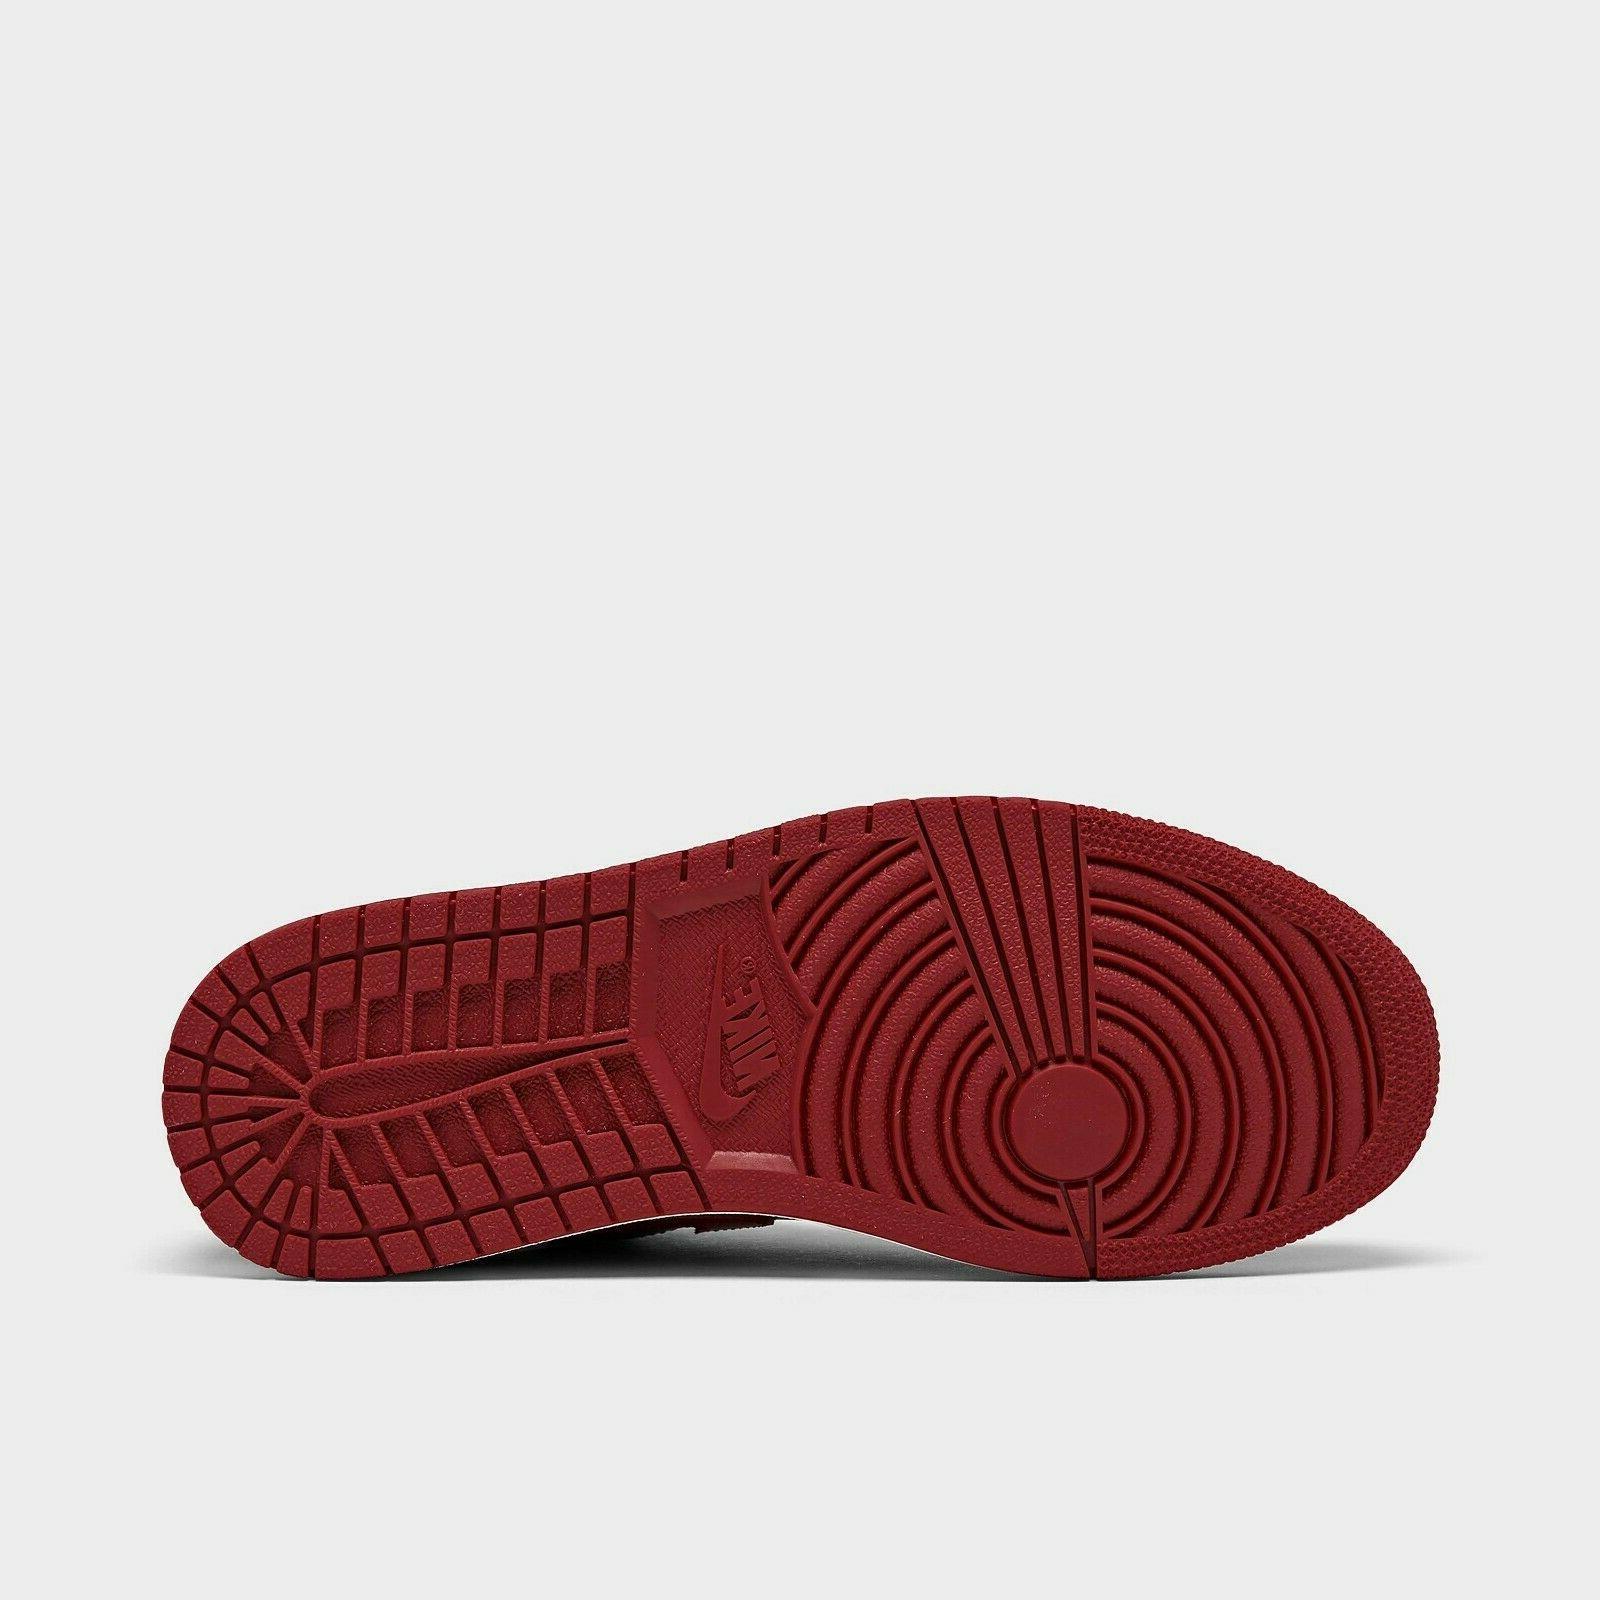 Air Jordan Bred Varsity Red Black